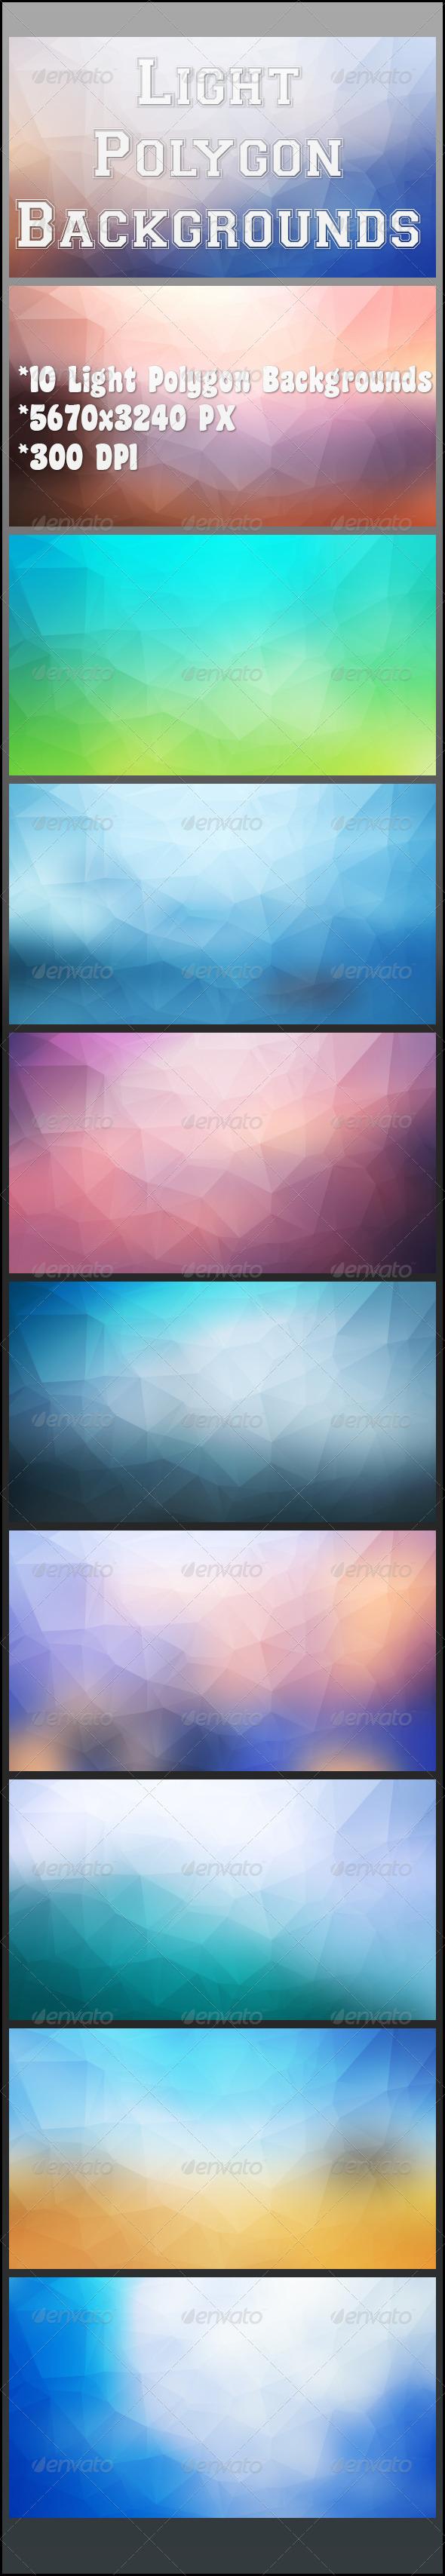 Light Polygon Backgrounds